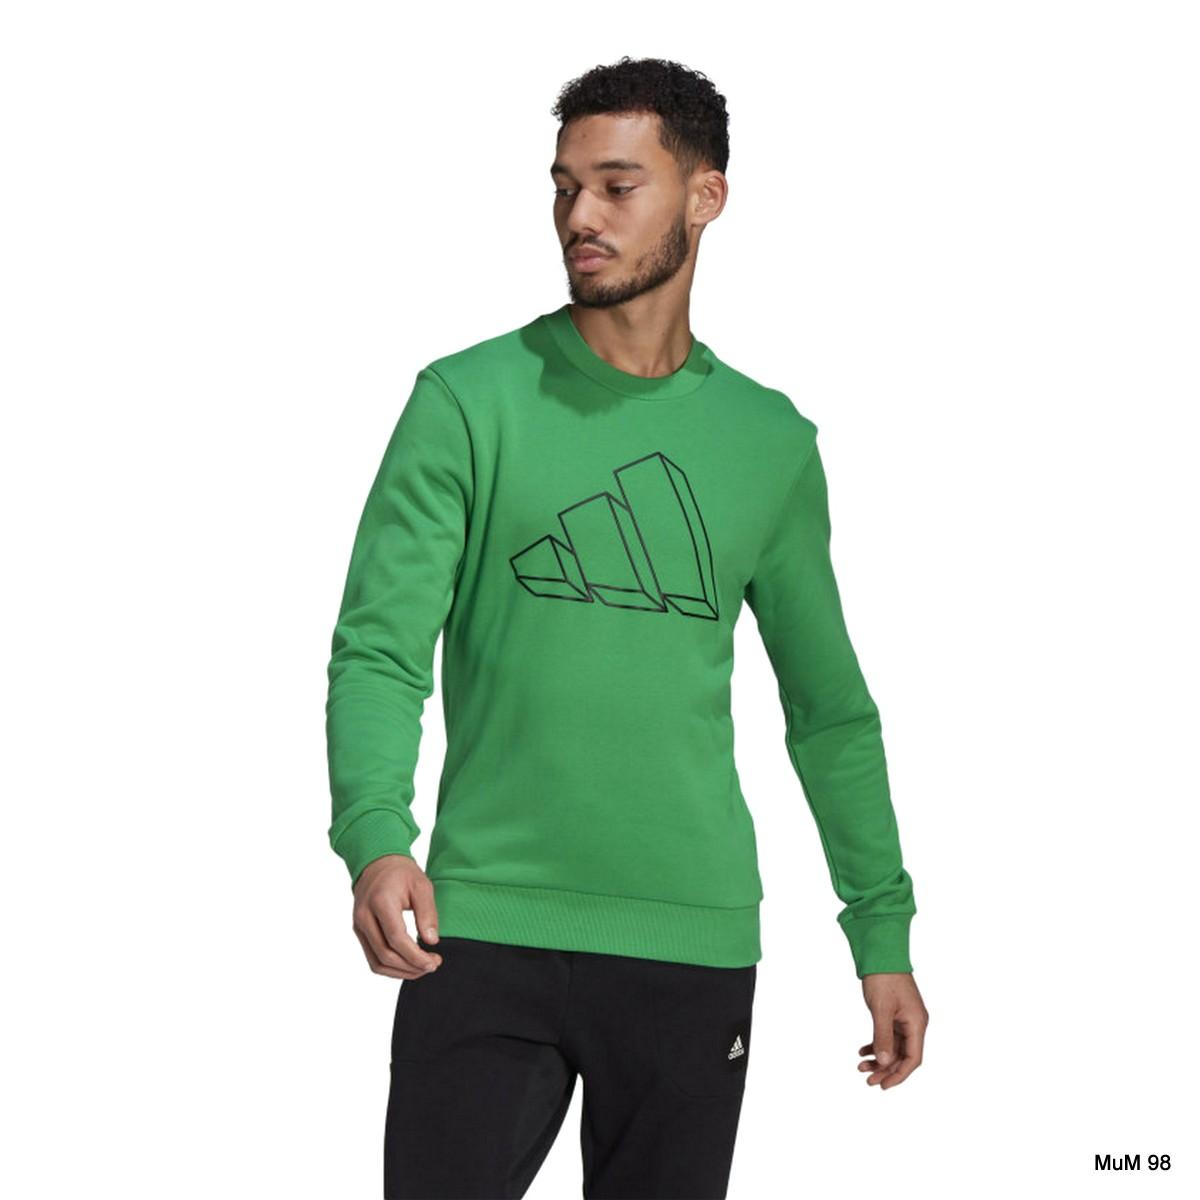 Adidas M FI GFX Crew